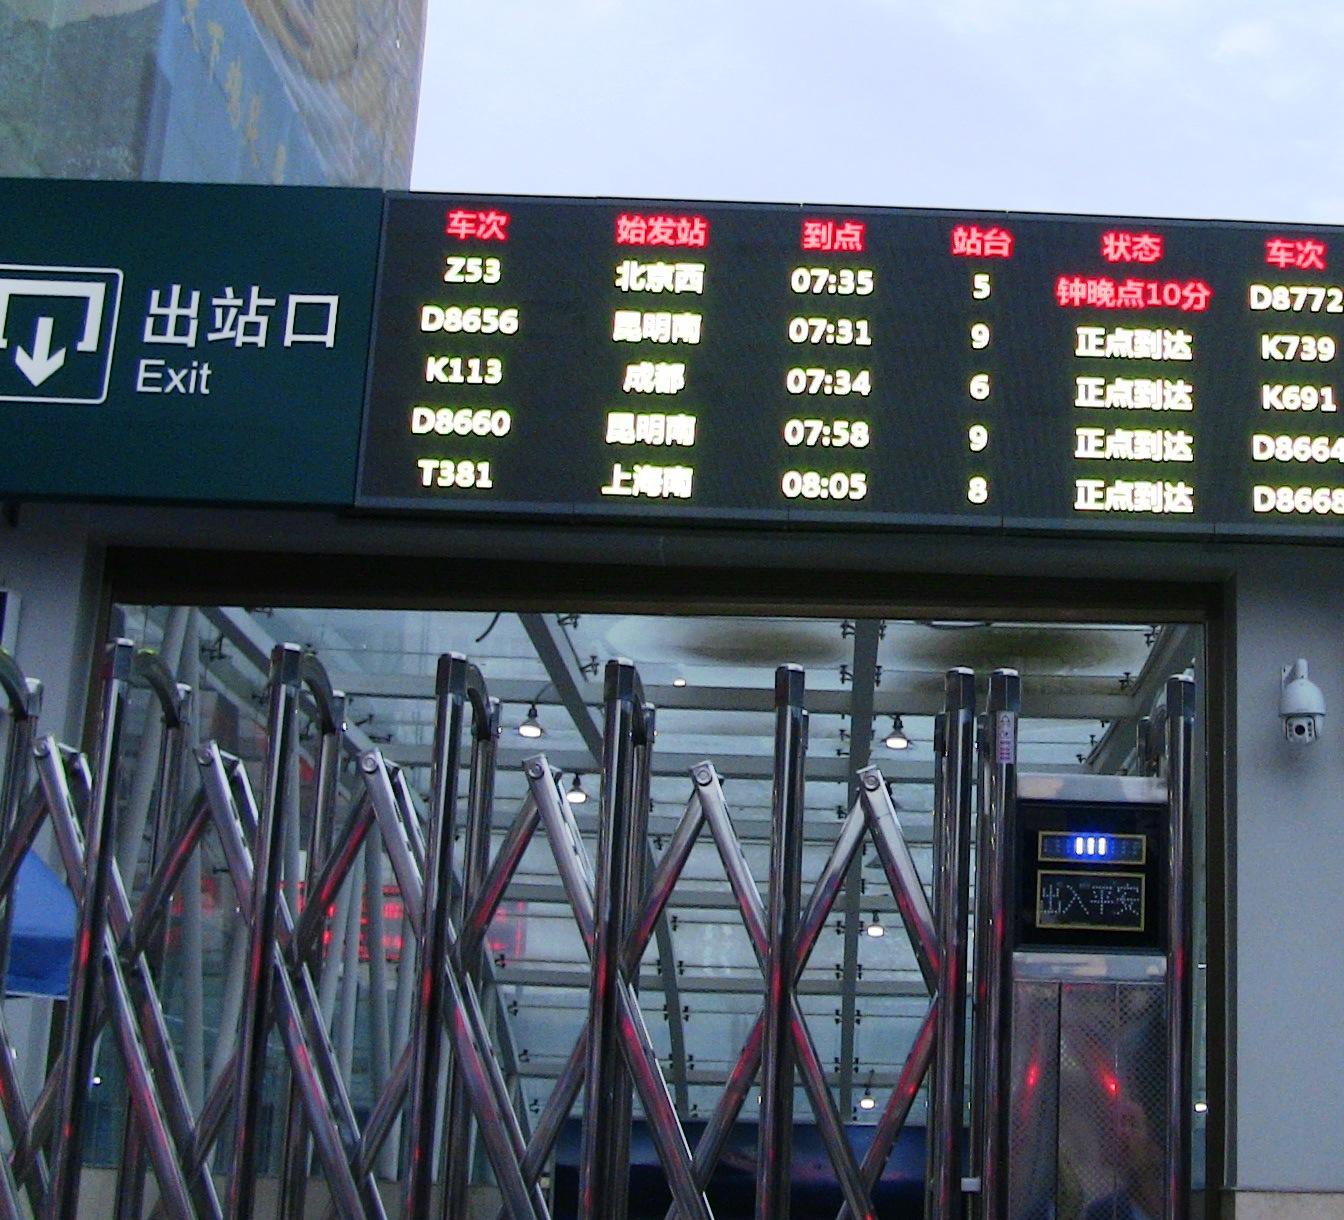 『 【ctrip】昆明・大理・麗江行き鉄道の切符受け取り 』 ..昆明駅に到着した乗客専用出口です。..